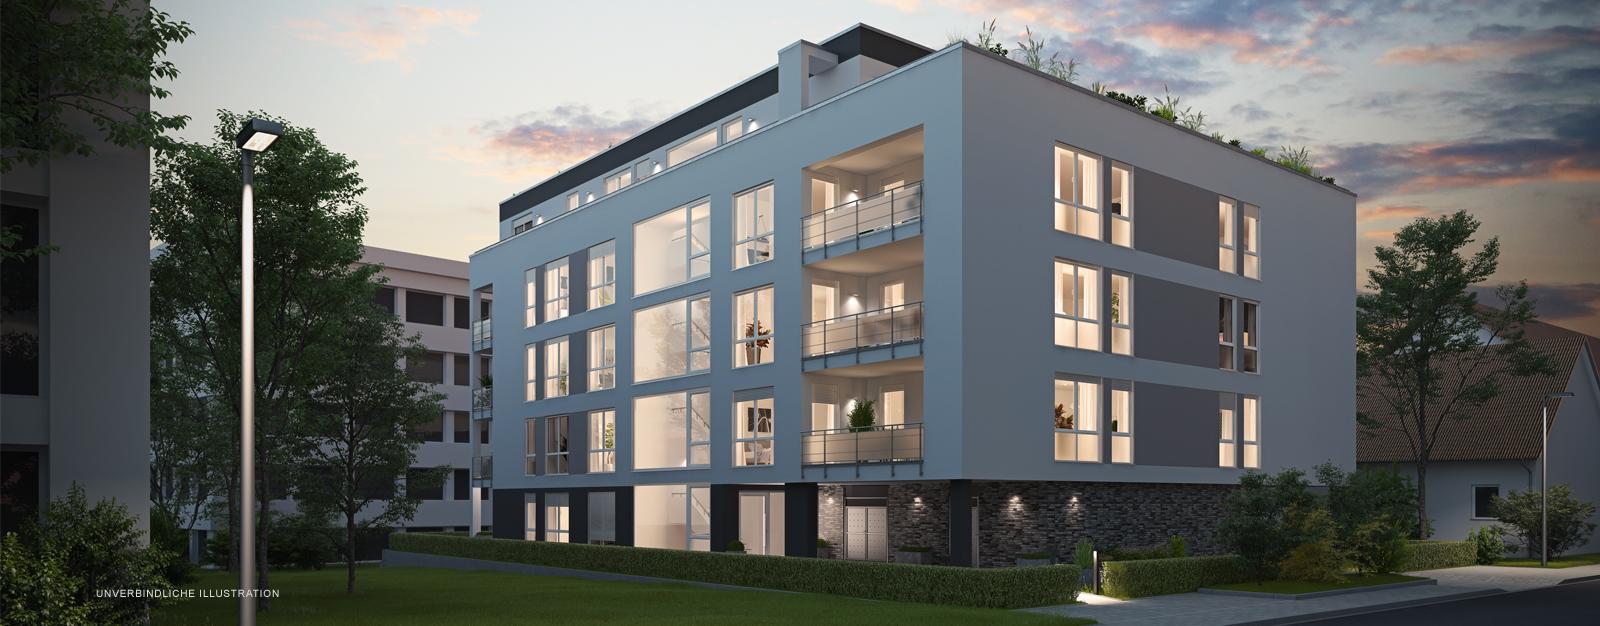 Leinfelden-Echterdingen, Urban Living